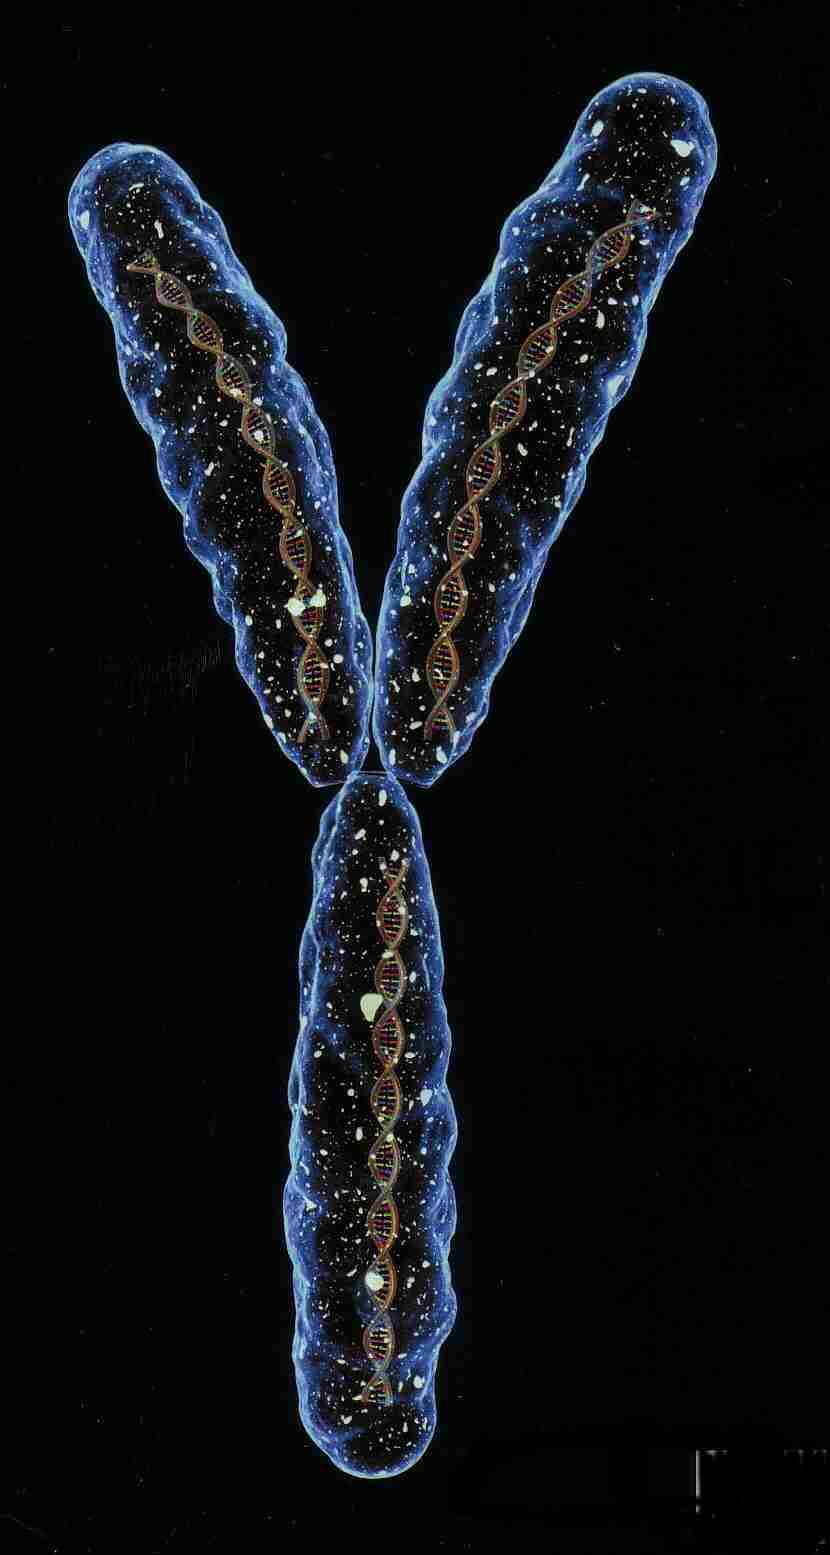 15q133 microdeletion syndrome  Chromosome